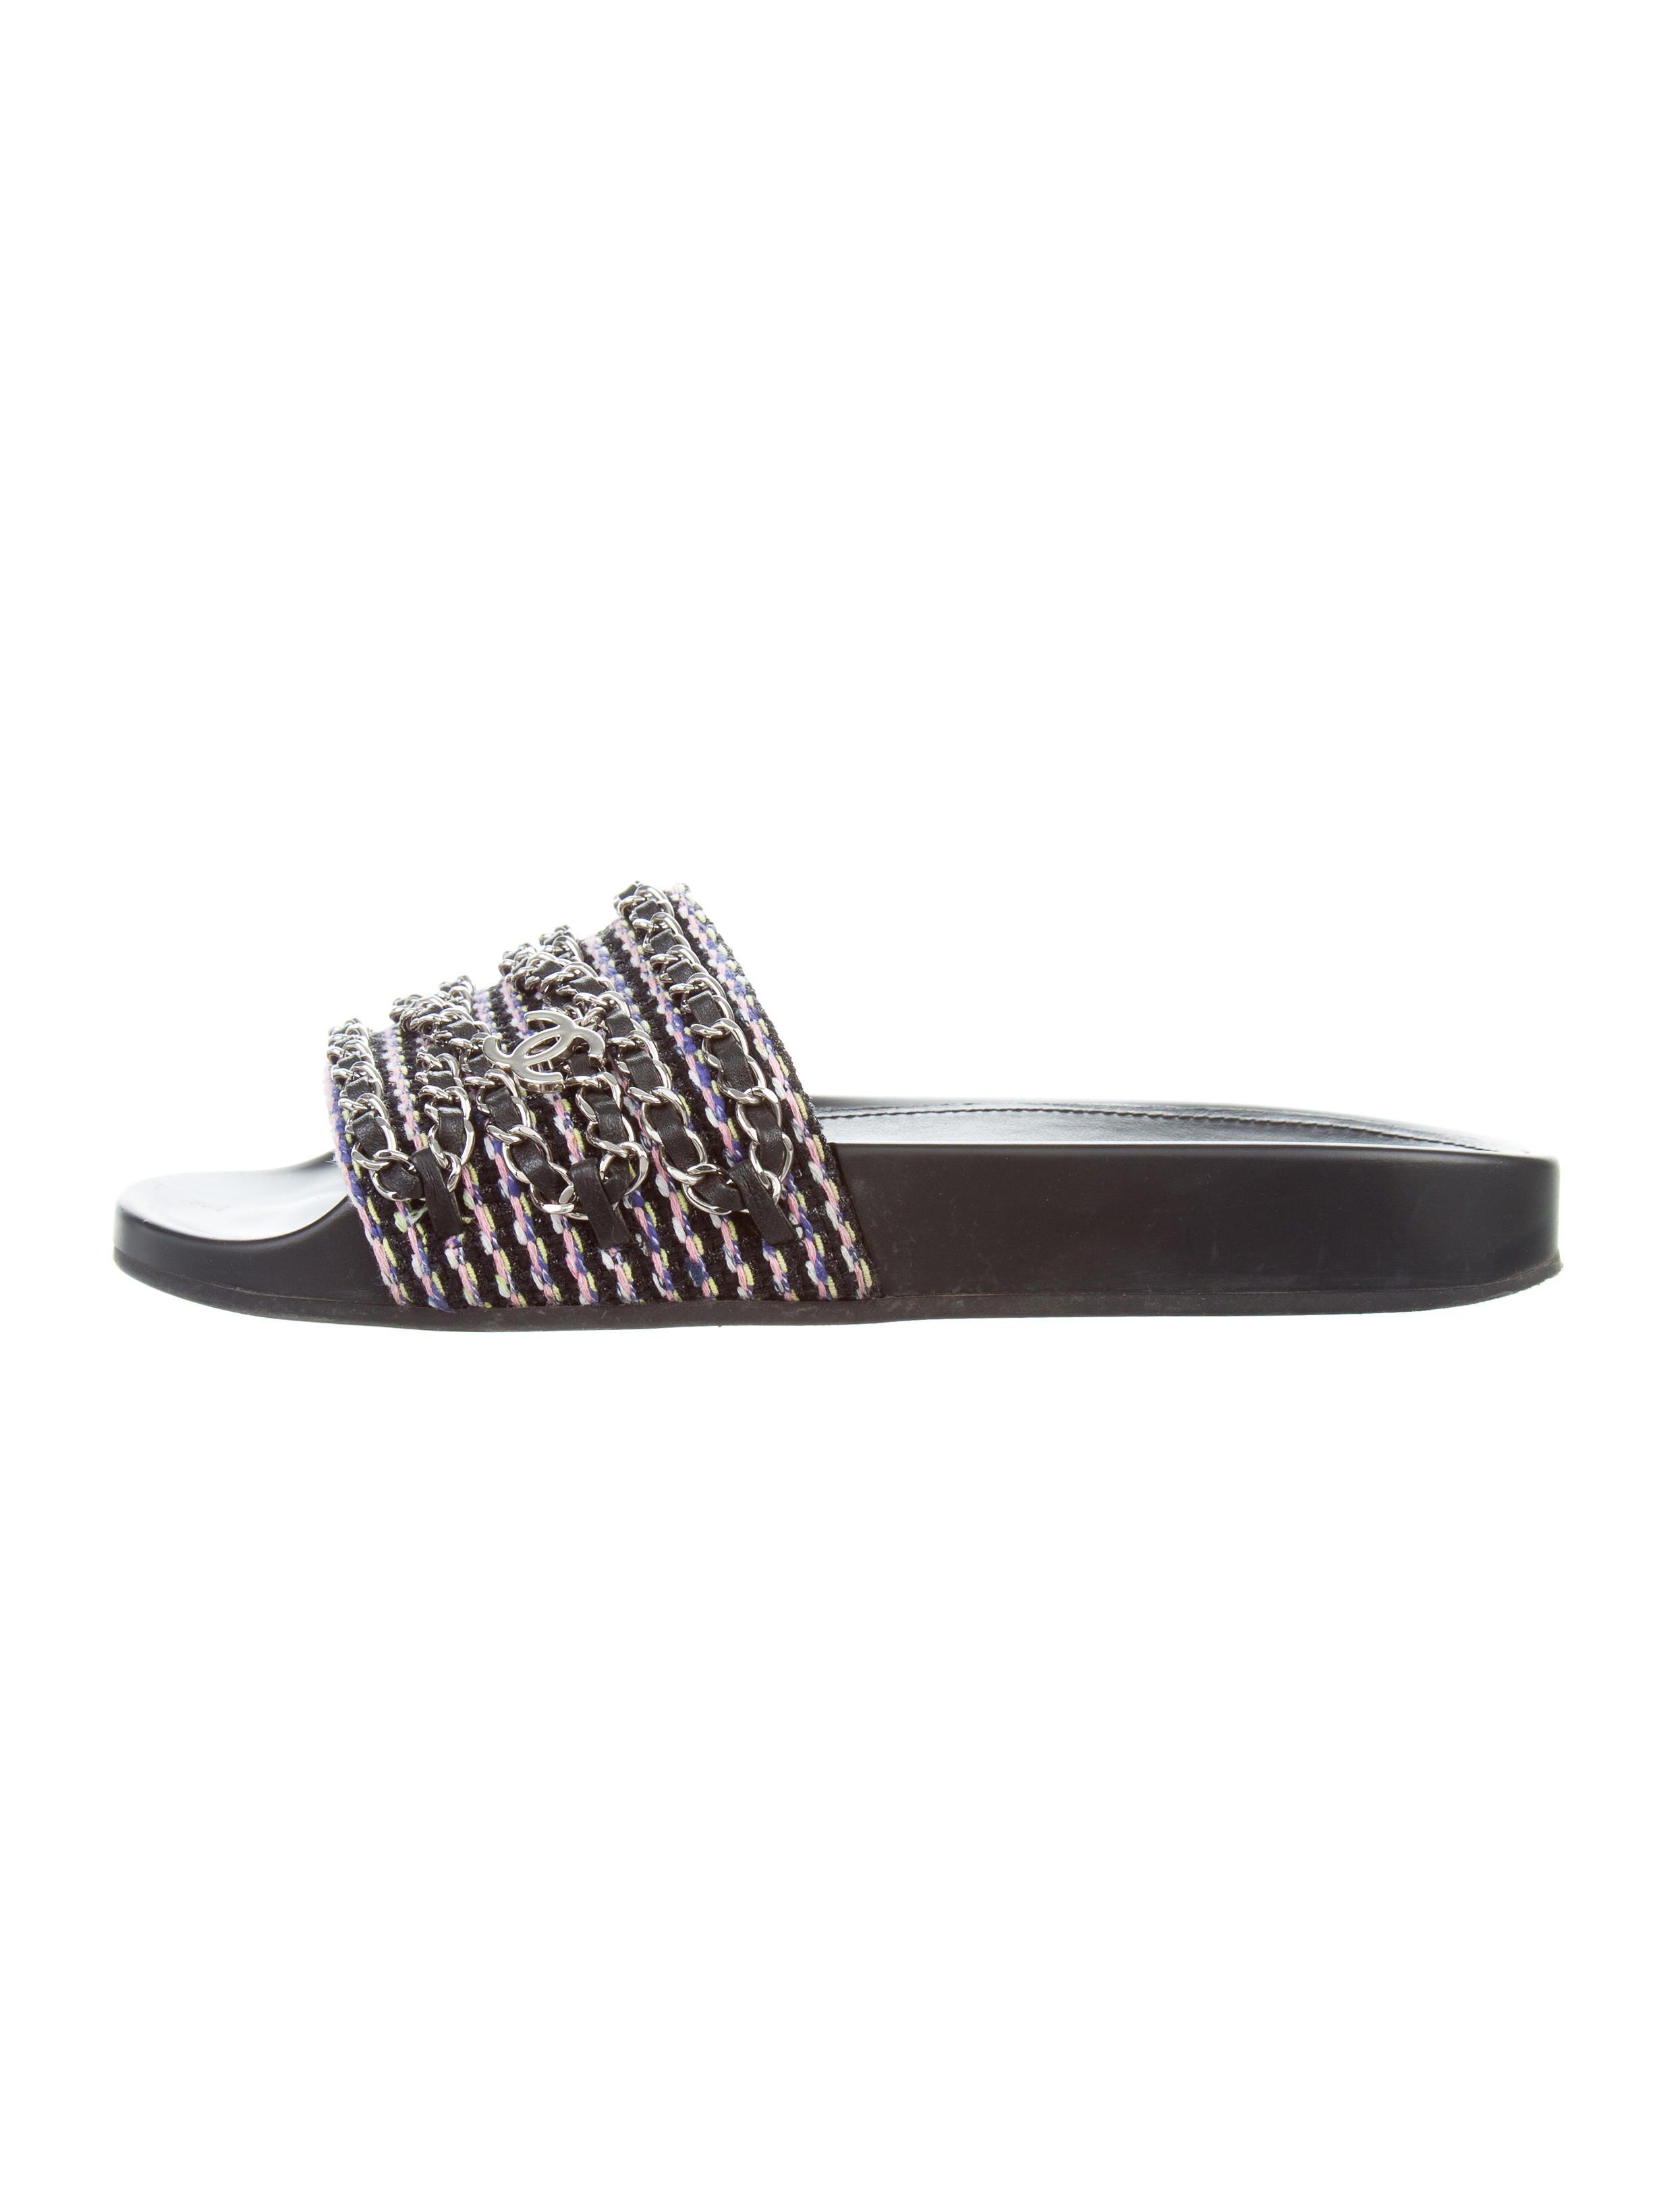 c3273907eb25 Chanel 2016 Tropiconic CC Tweed Sandals - Shoes - CHA214083